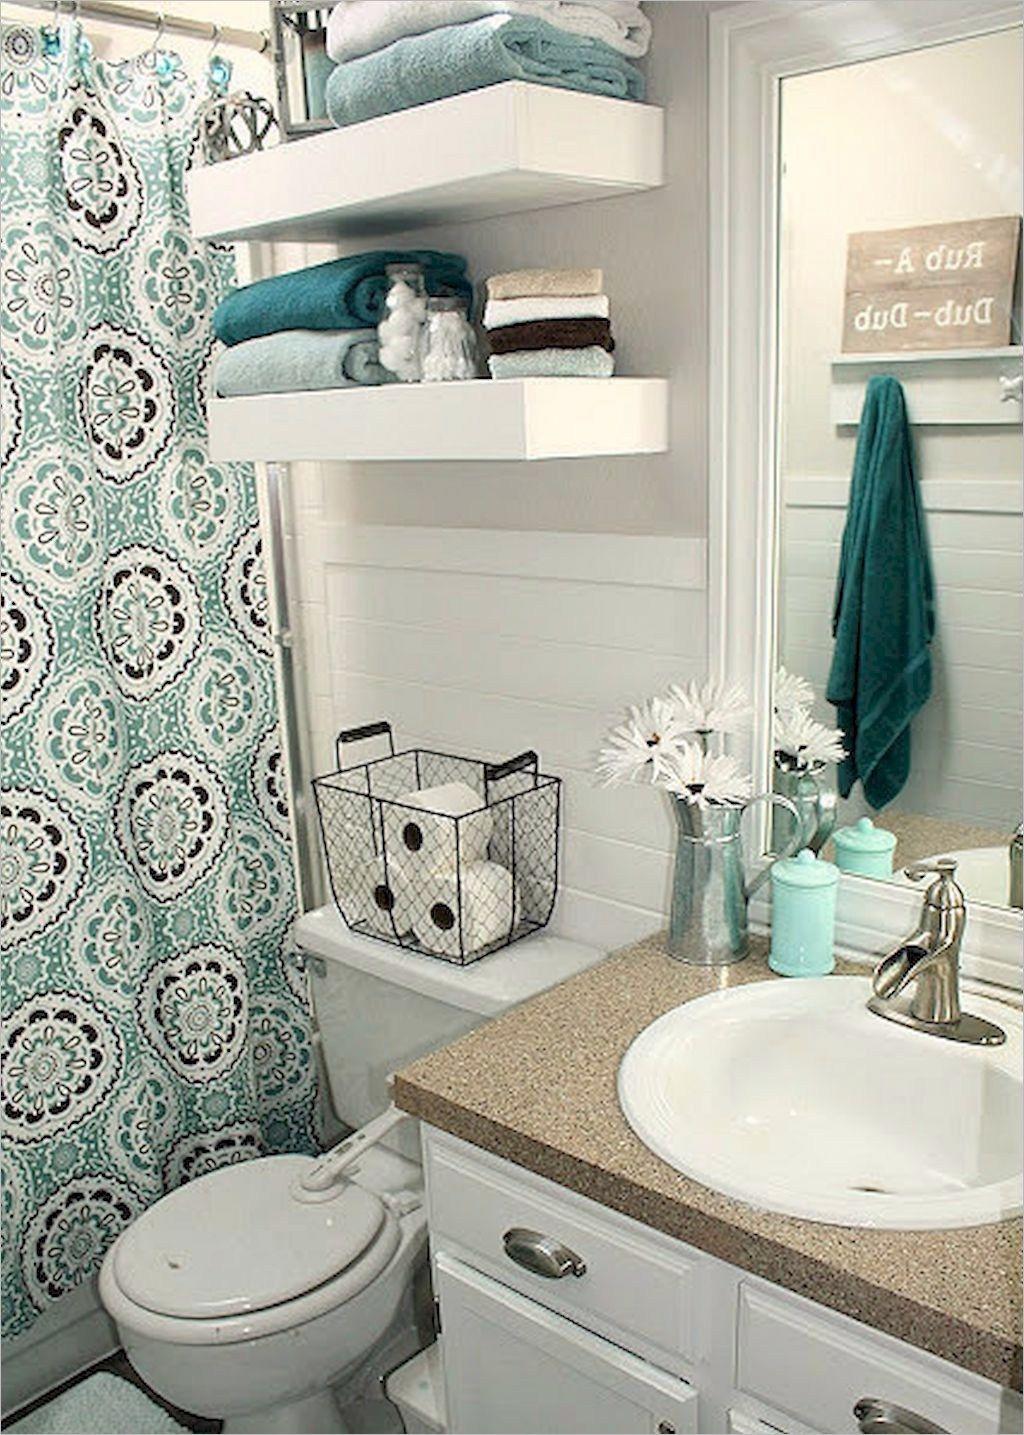 Bathroom Accessories Decorating Ideas Small Bathroom Decor